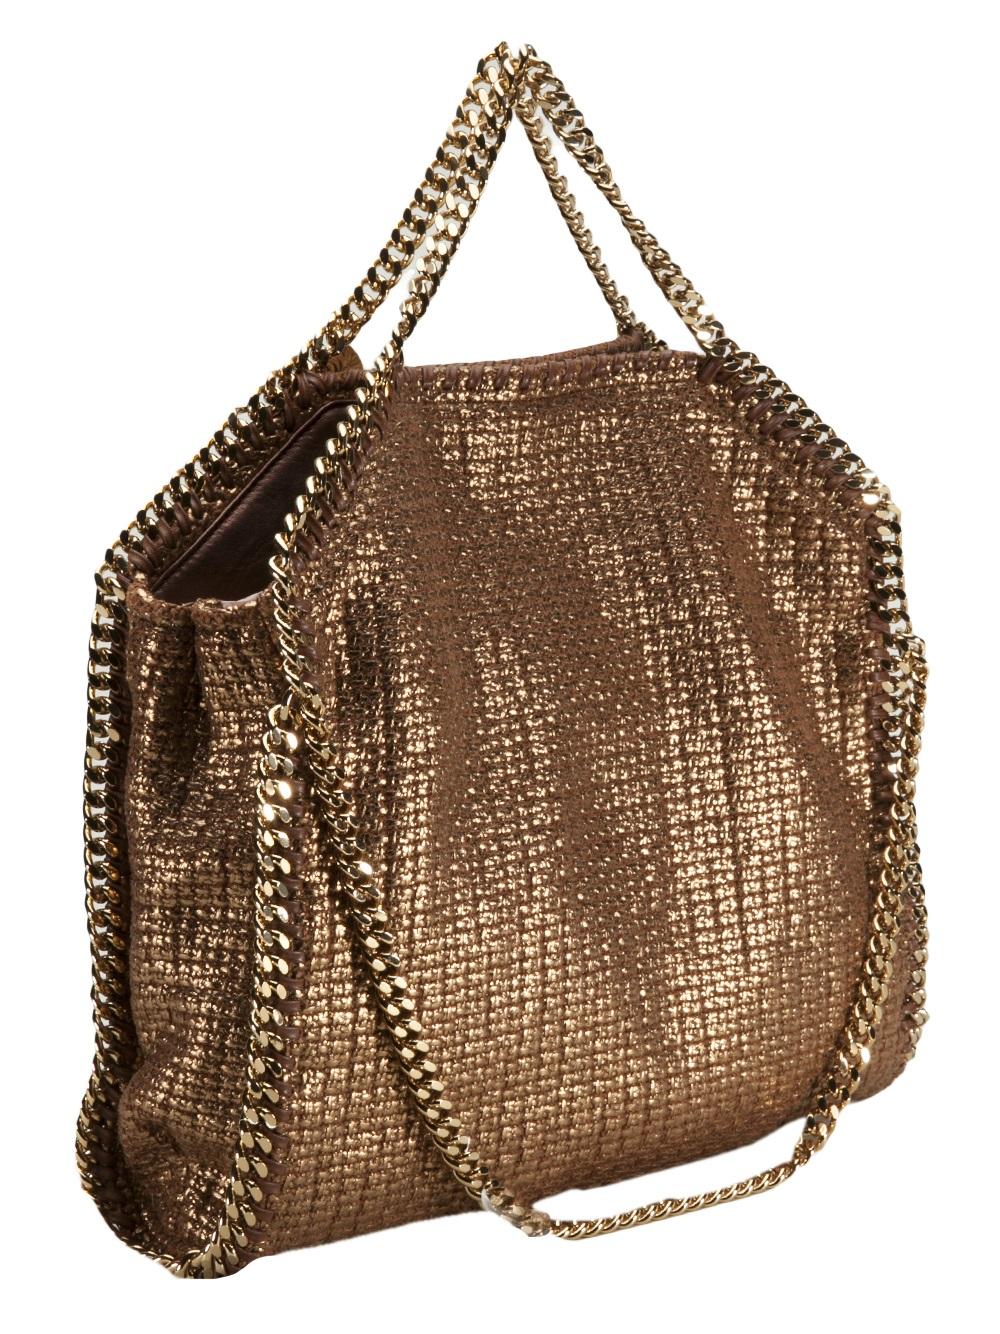 74bce021b8 Stella Mccartney Small Falabella Backpack. Lyst - Stella Mccartney Small  Falabella Foldover Bag in Metallic